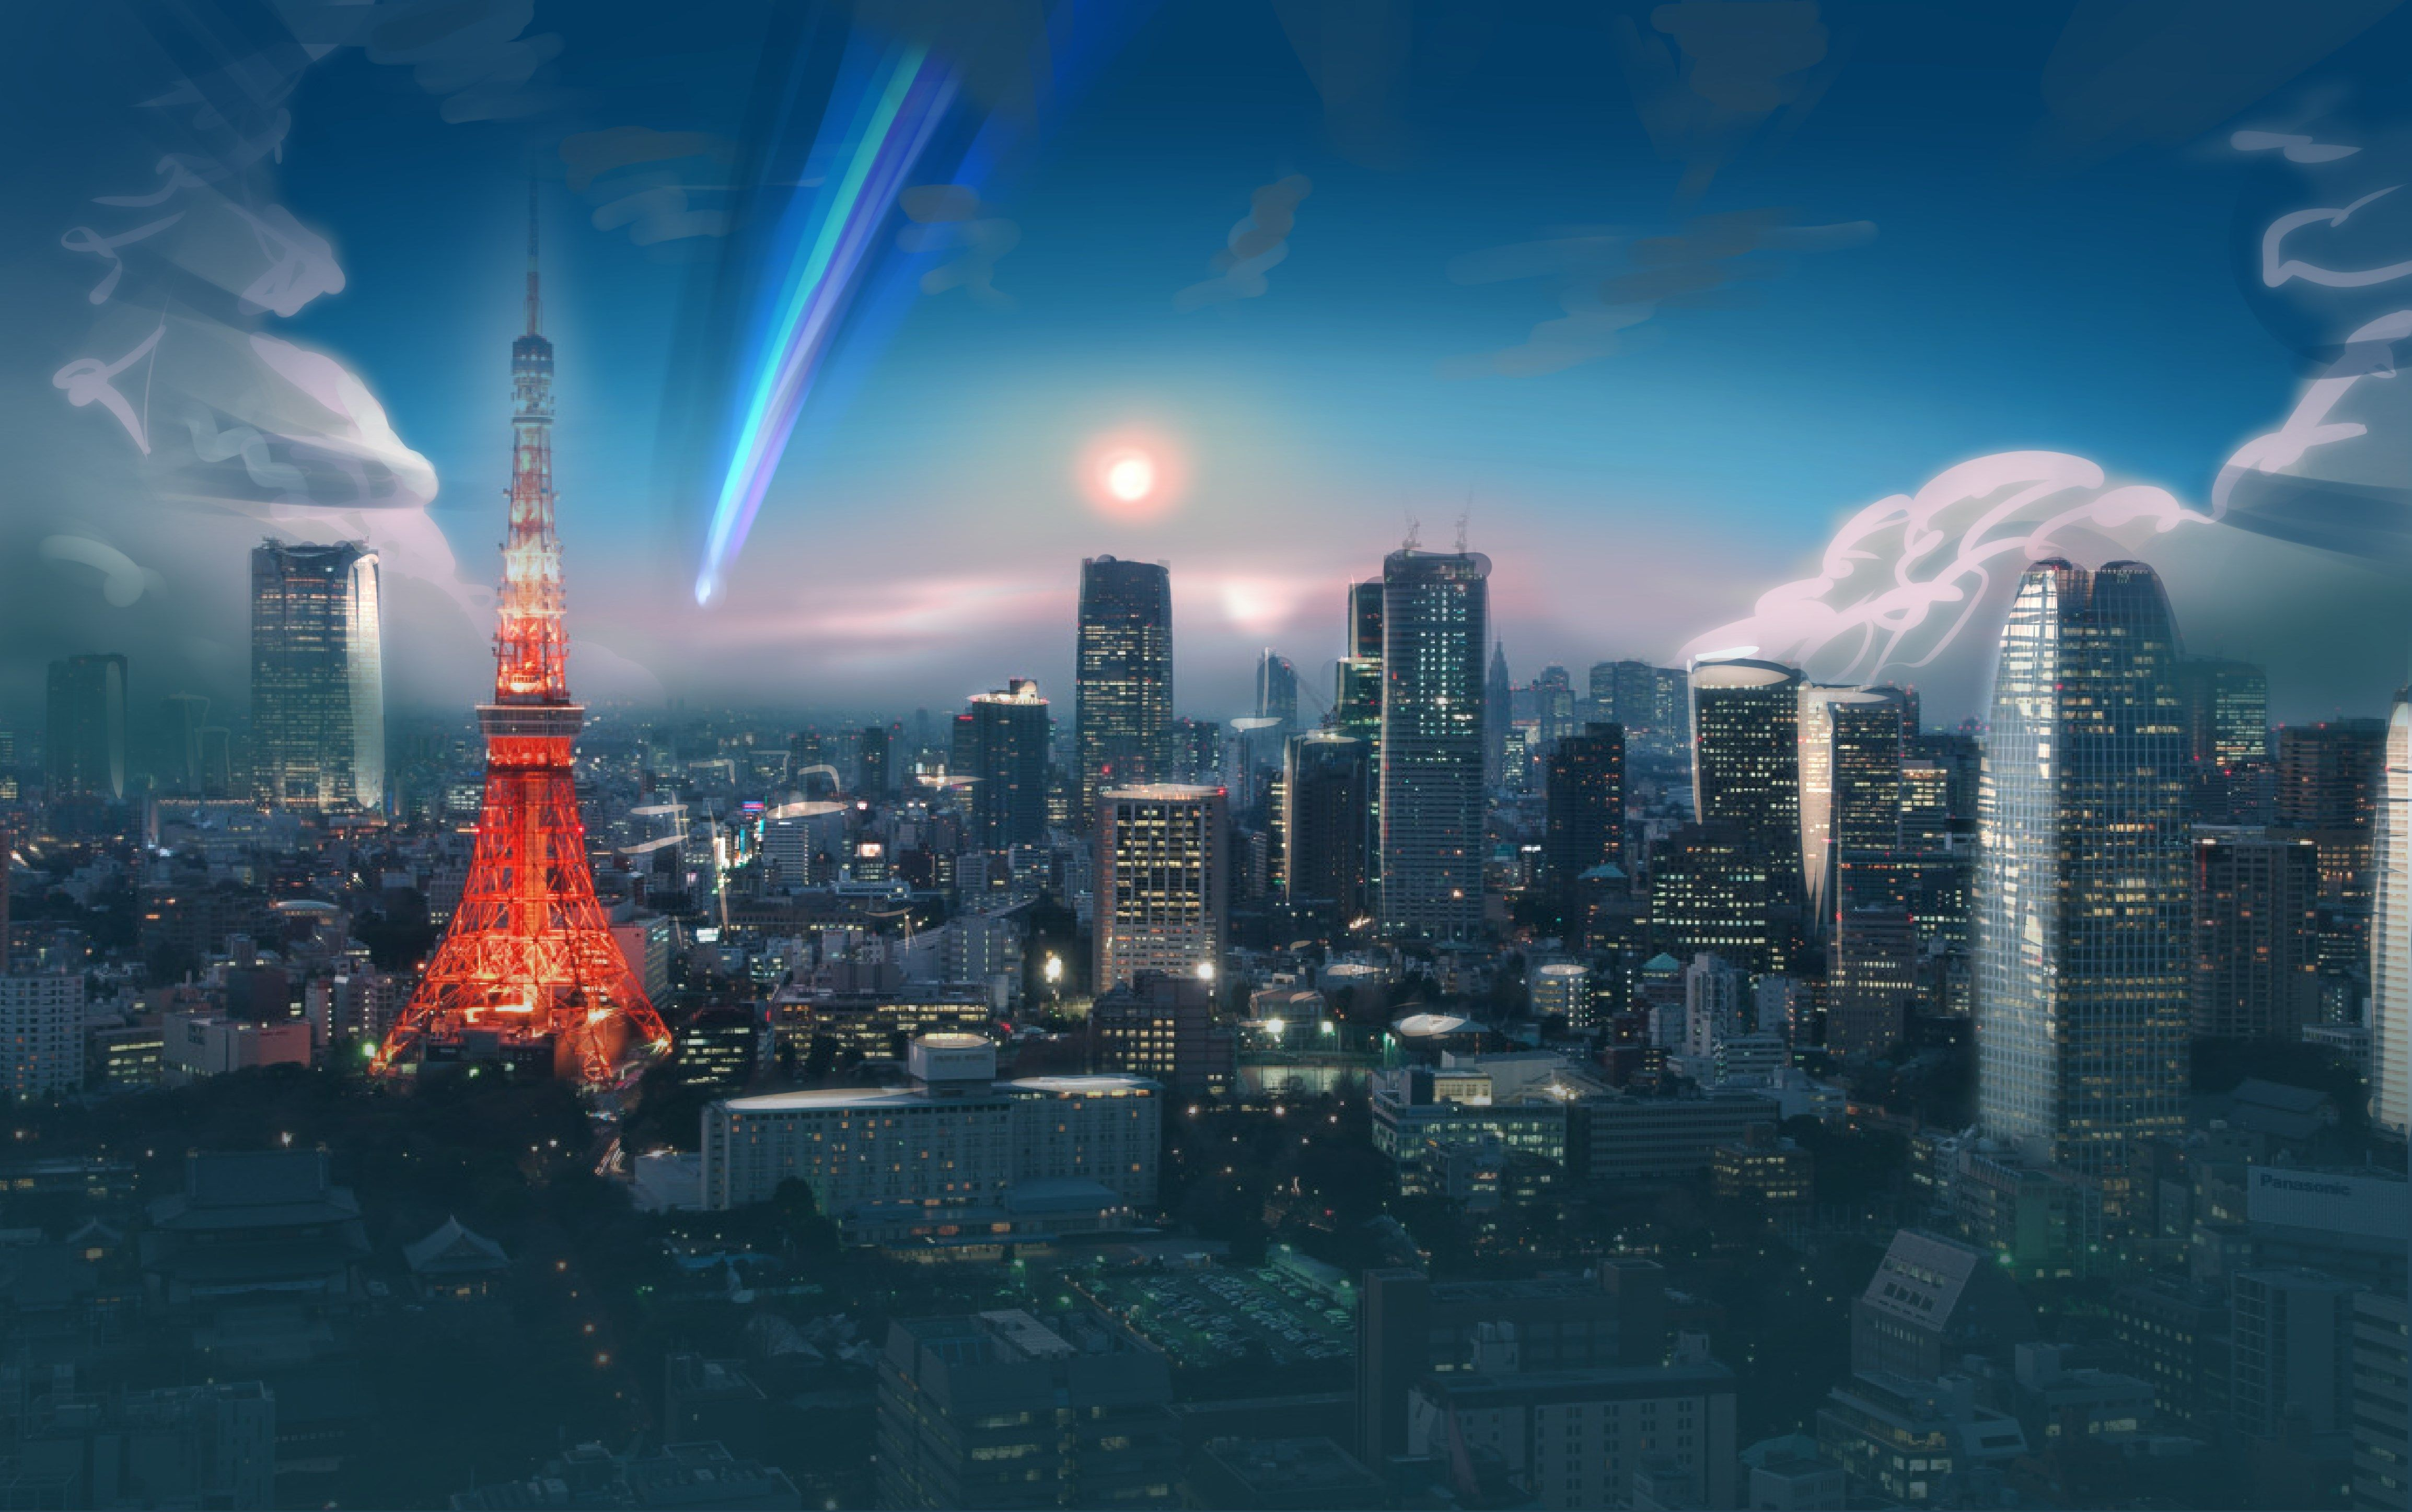 your name 4k wallpaper 4616x2894 Anime city Tokyo city Japan 4616x2894